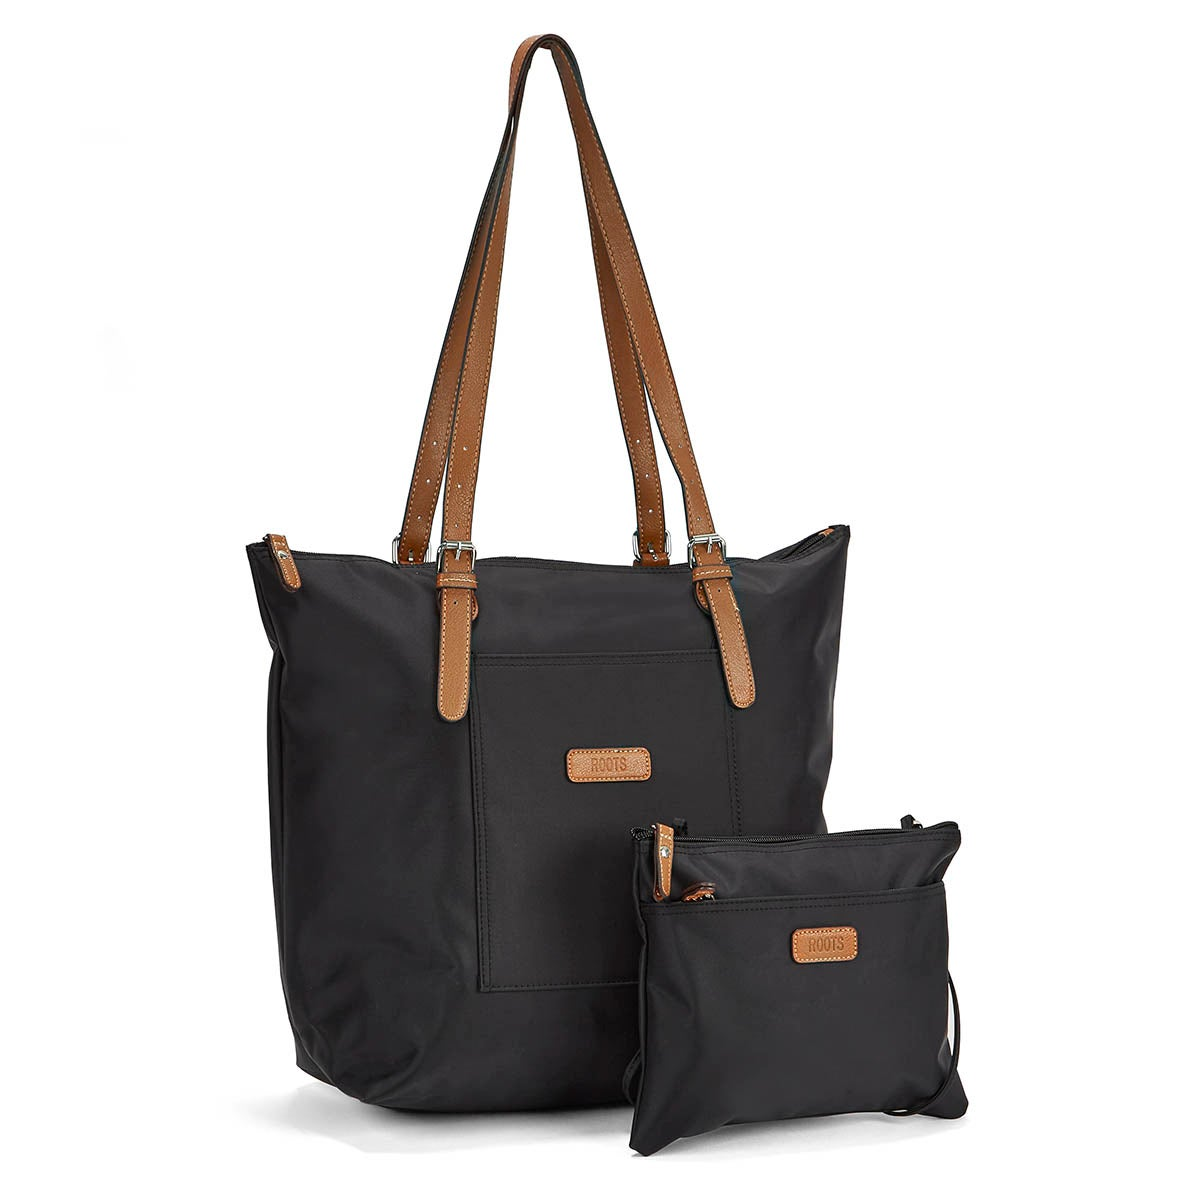 Women's R4324 black 2 in 1 tote/crossbody bag